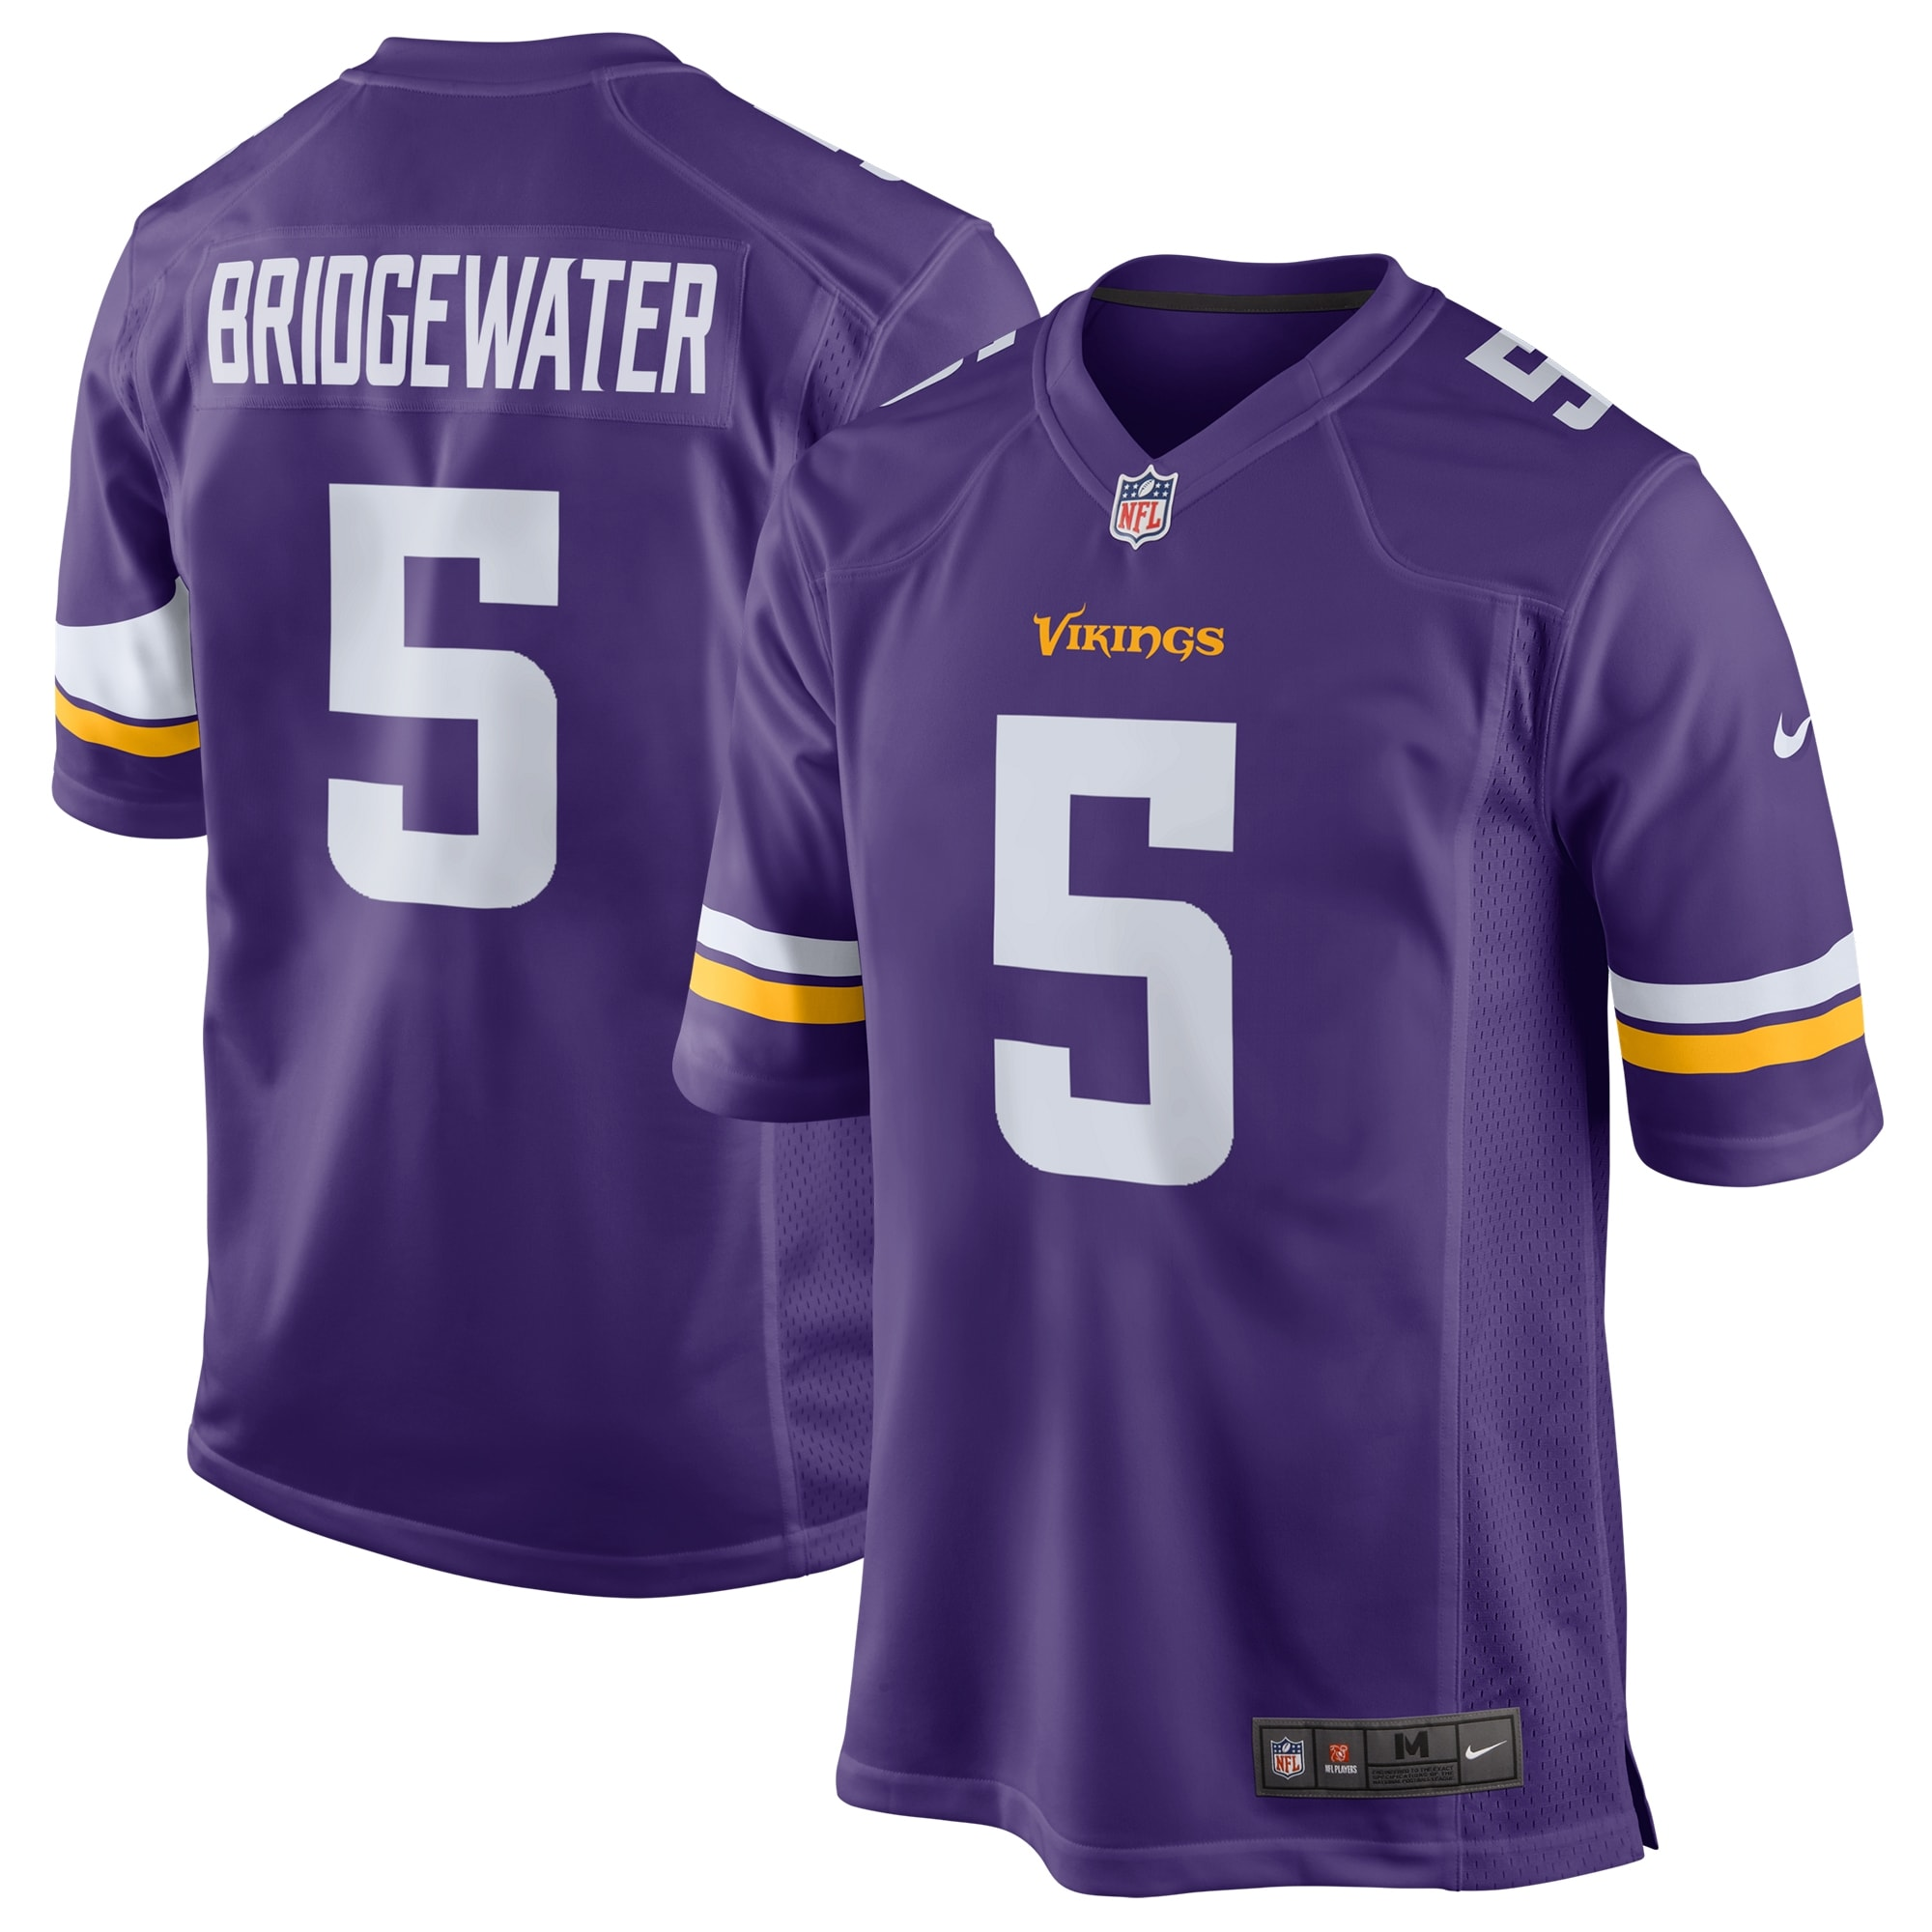 Teddy Bridgewater Minnesota Vikings Nike Game Jersey - Purple - Walmart.com